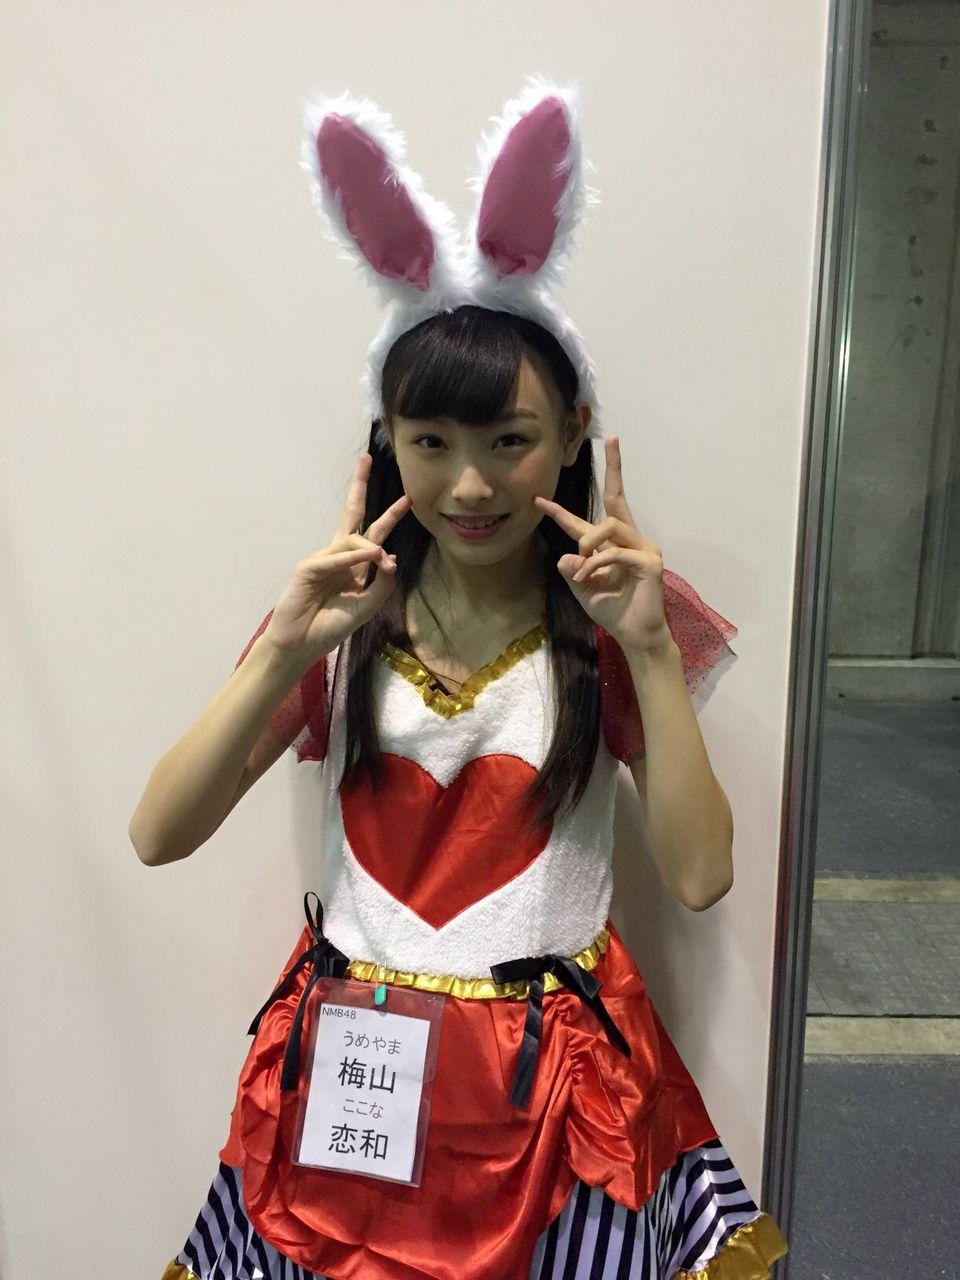 【NMB48】梅山恋和が上西恵に私信【ぴょんぴょん】